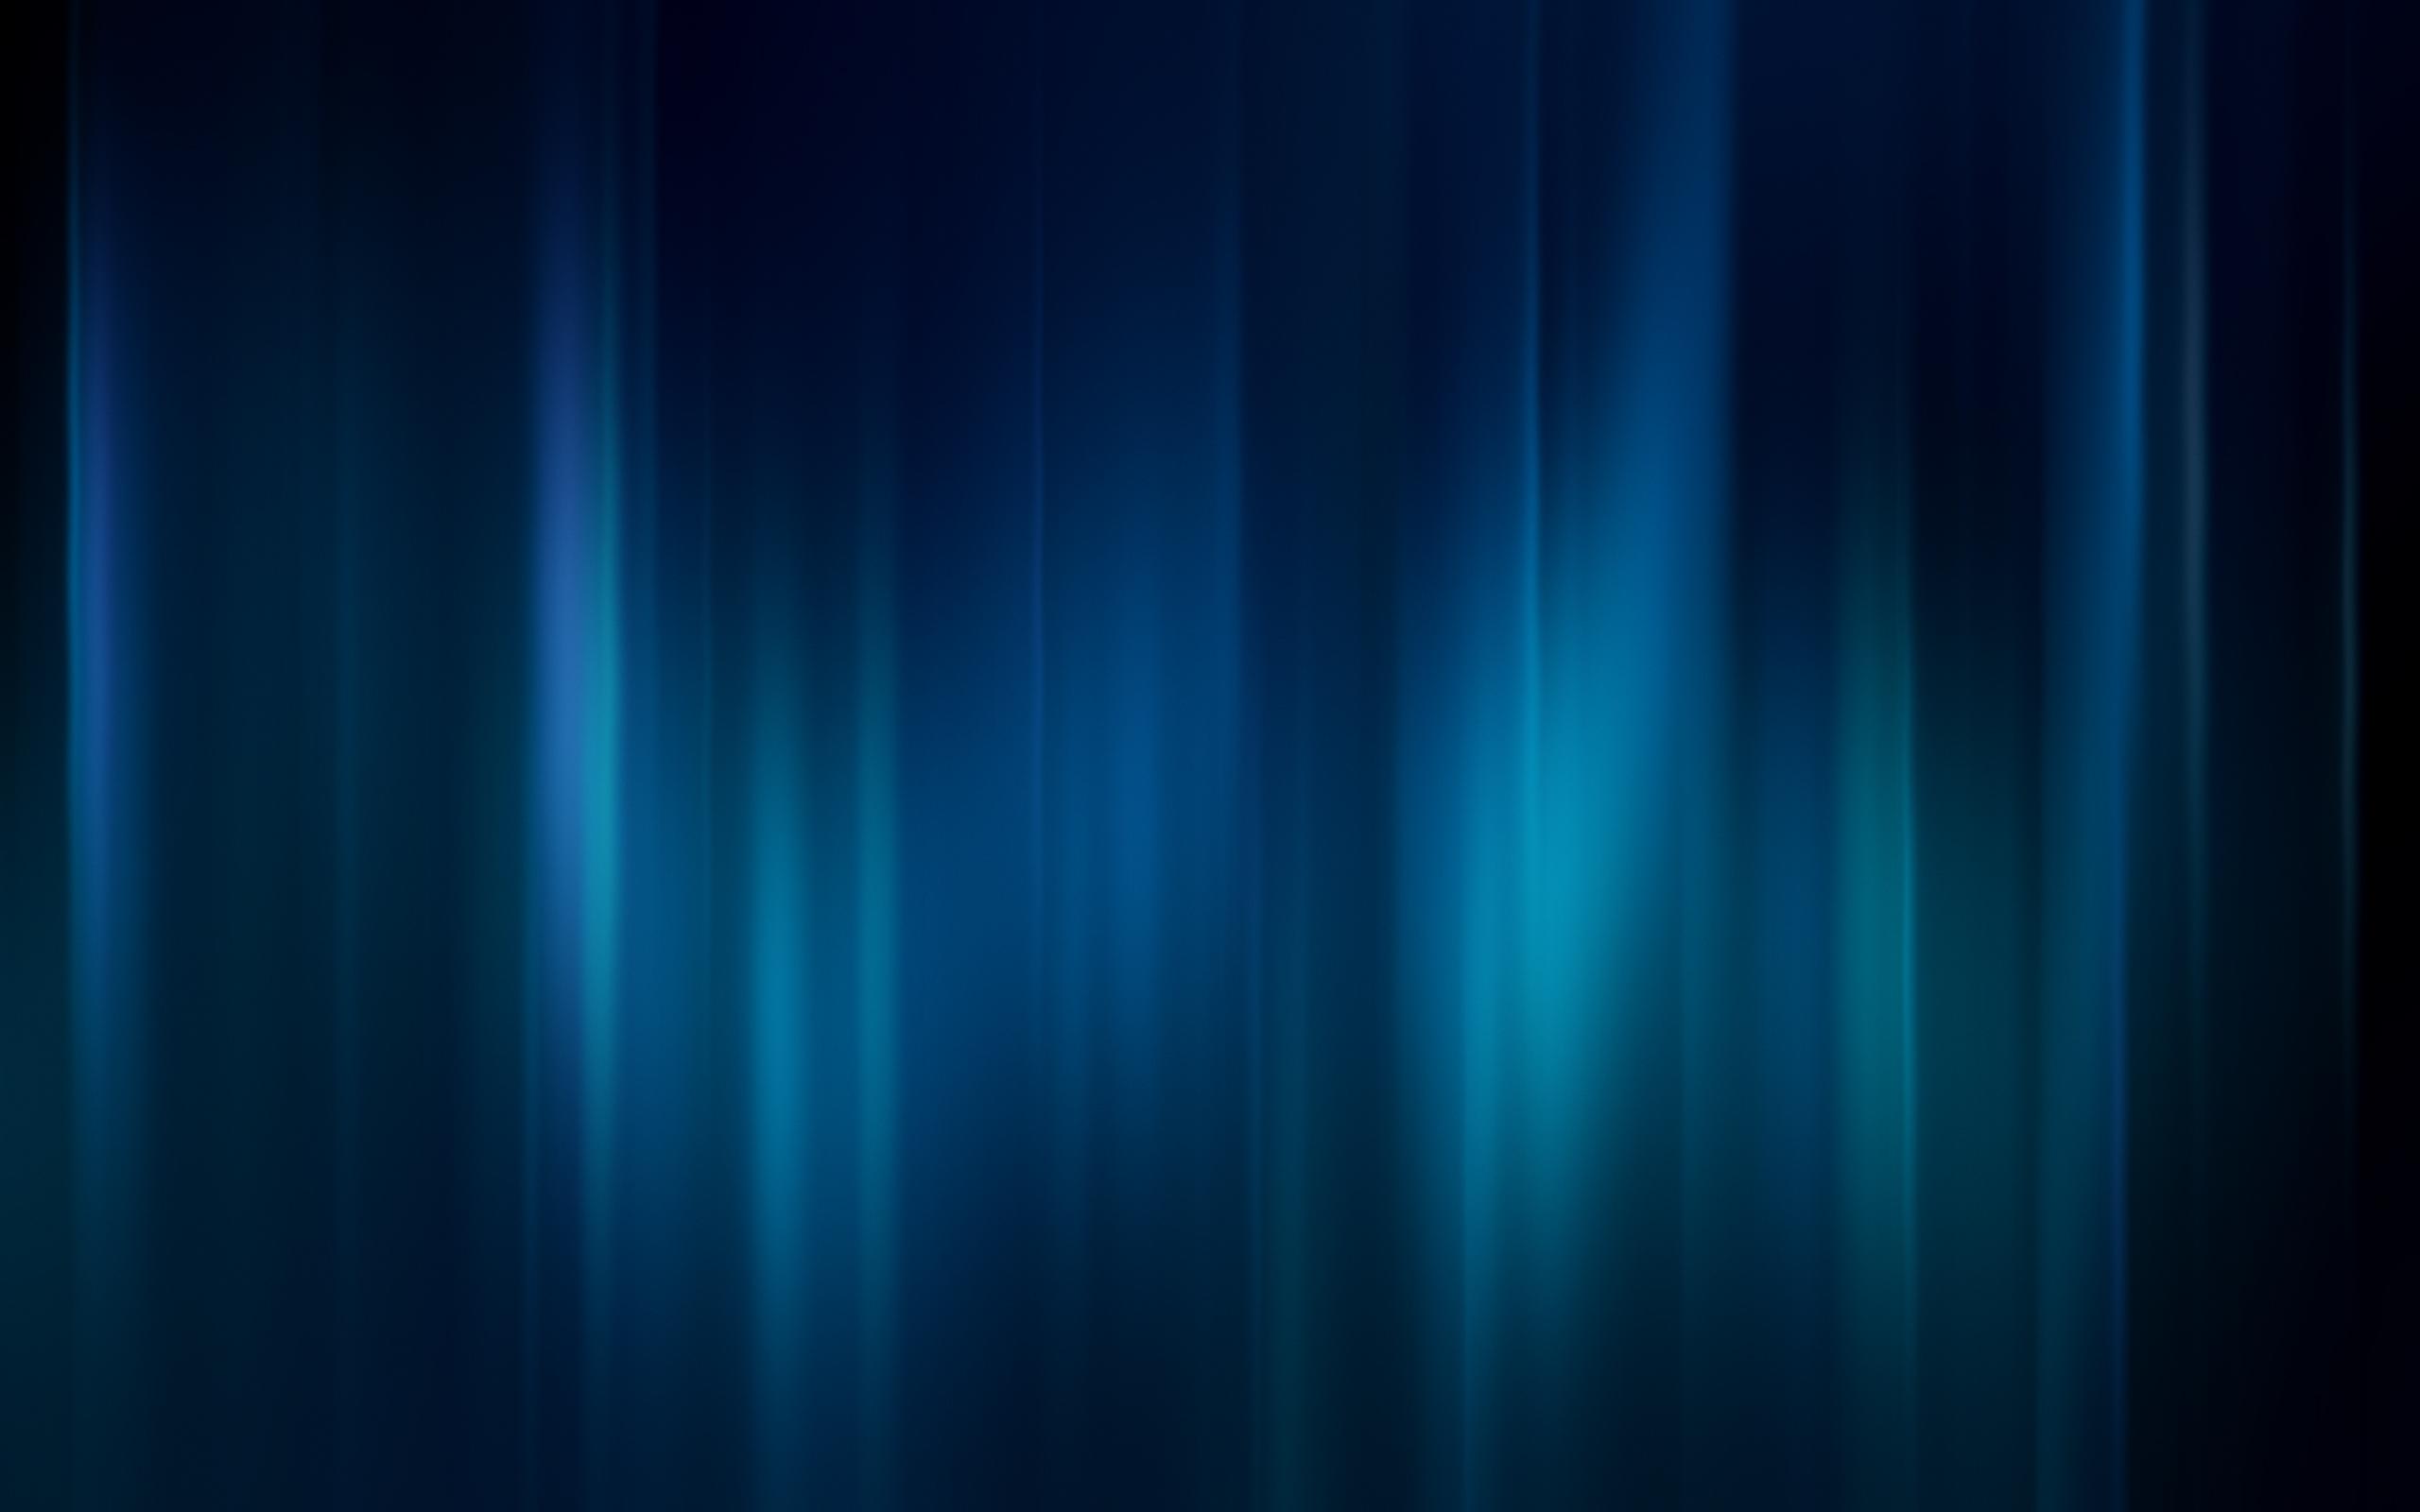 download modern guitar wallpaper saruman backgrounds cool 2560x1600